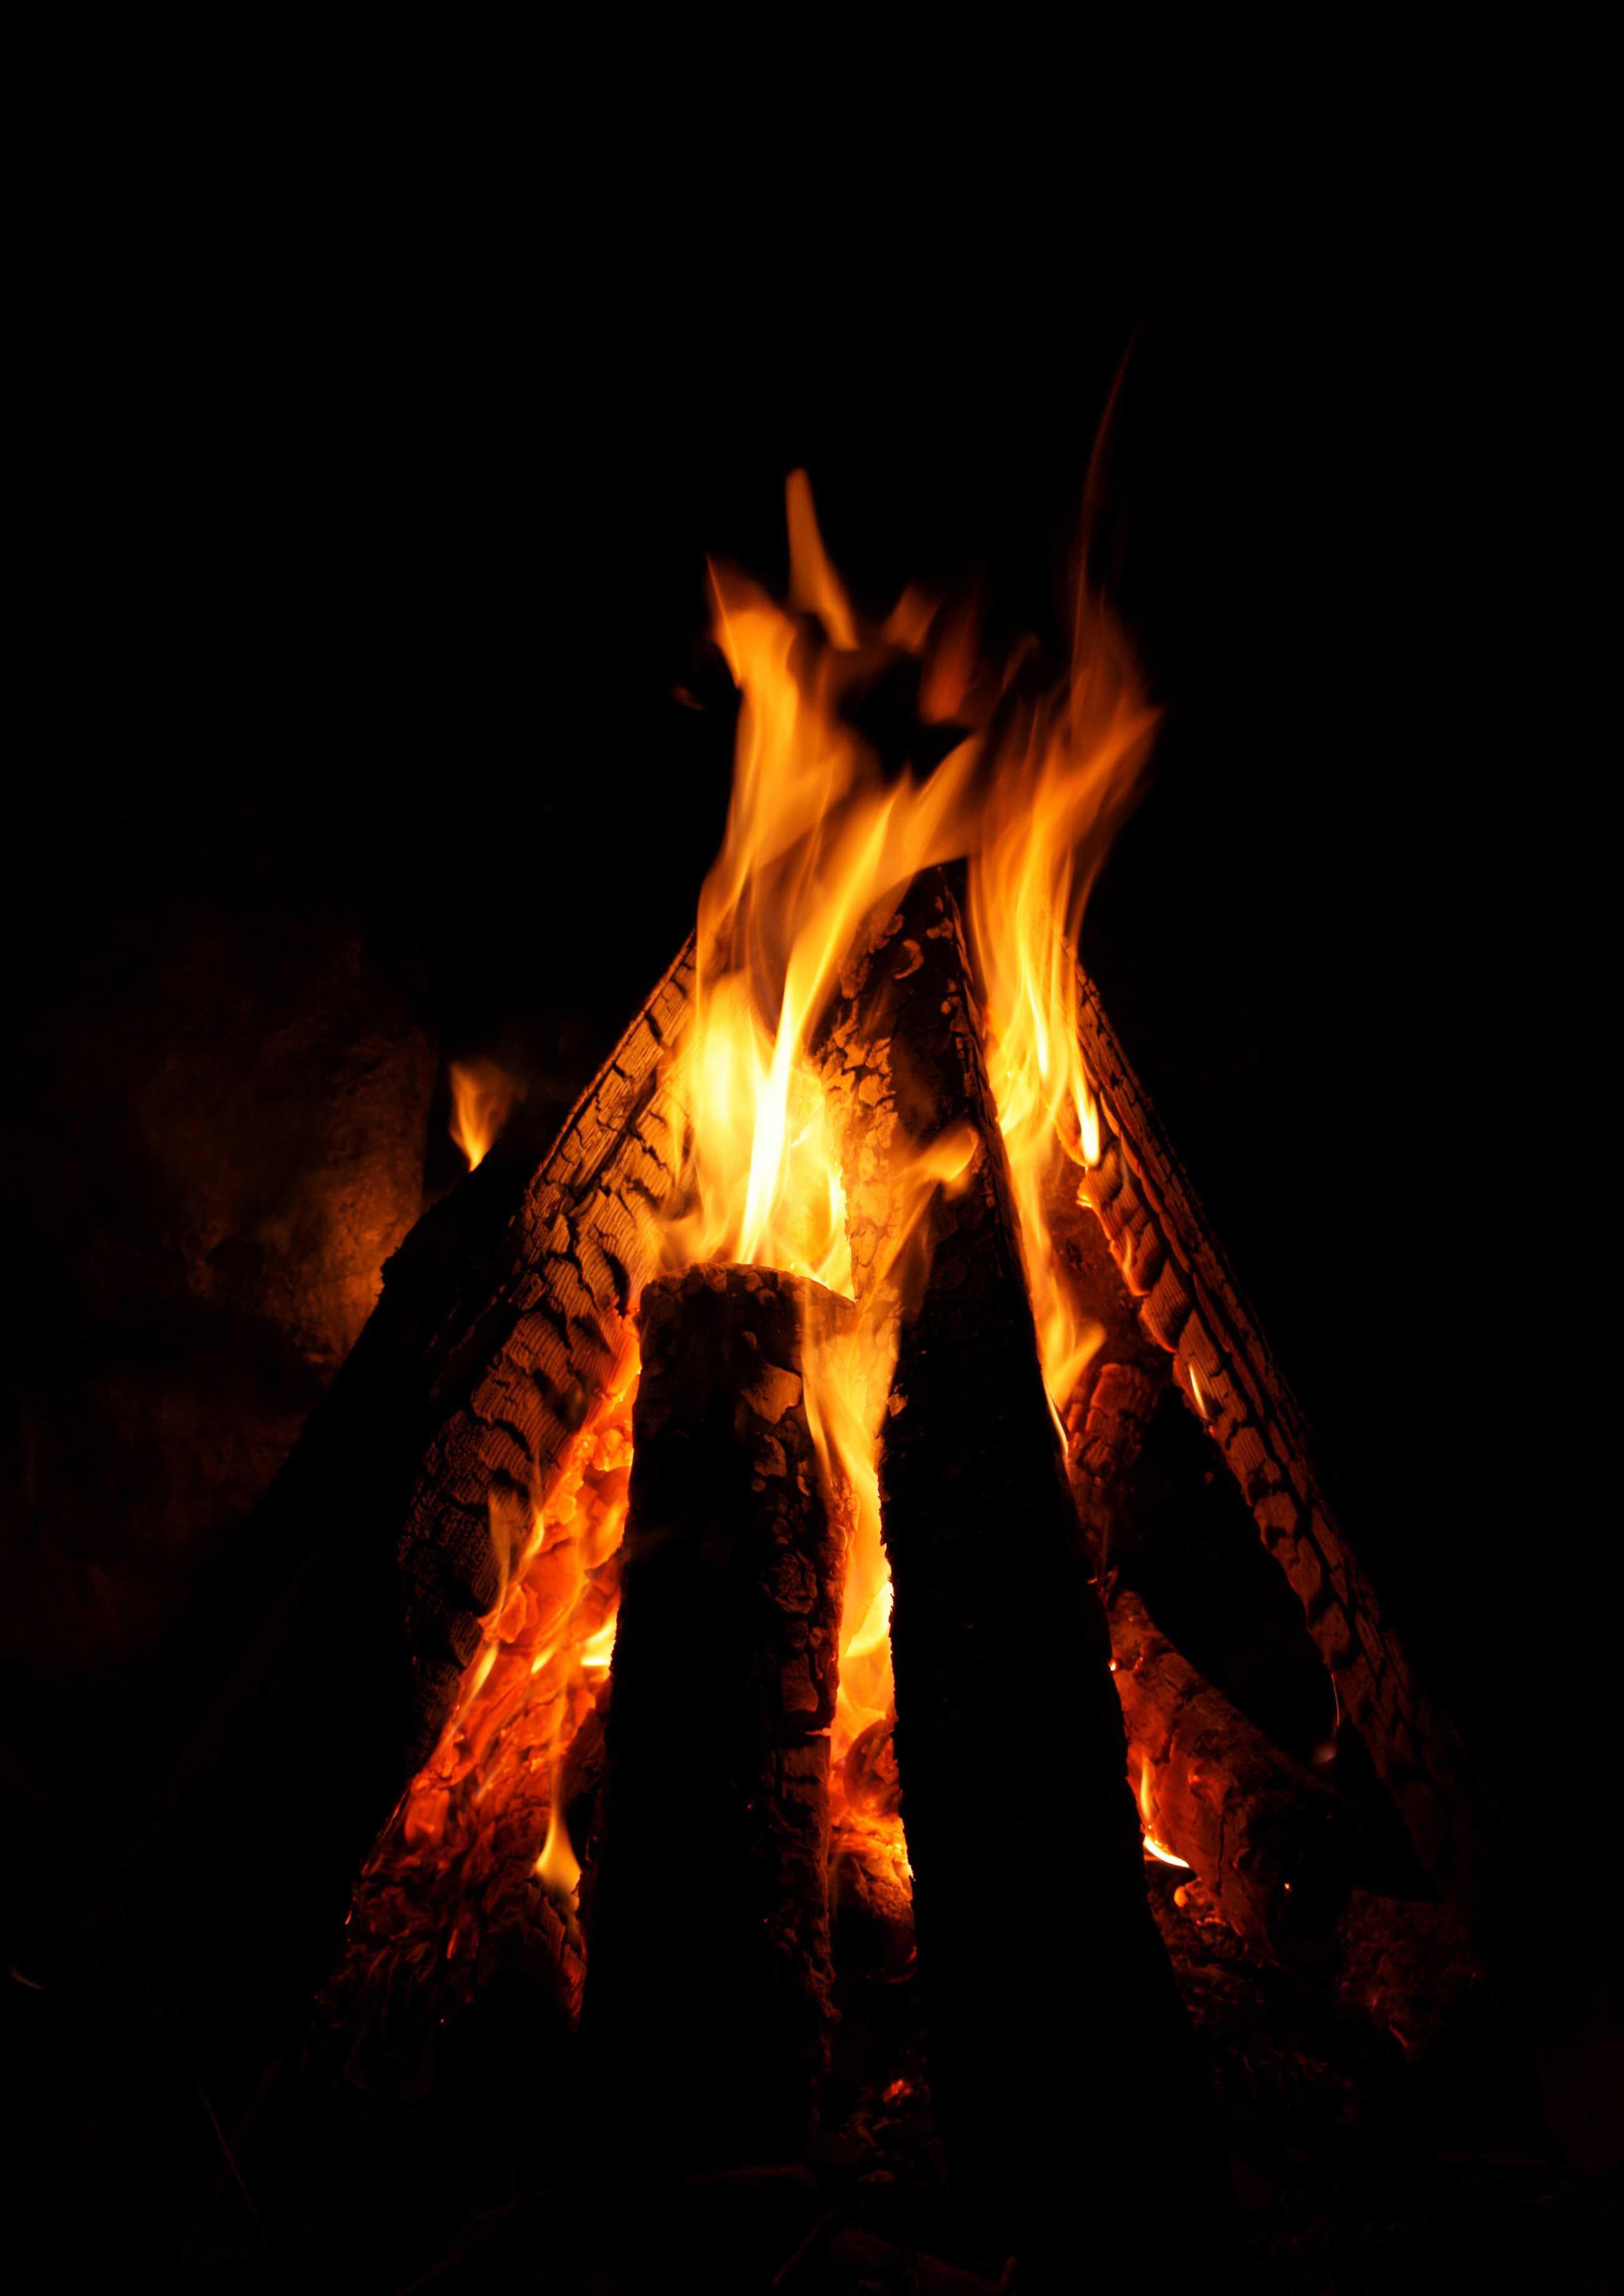 Smoky Campfire